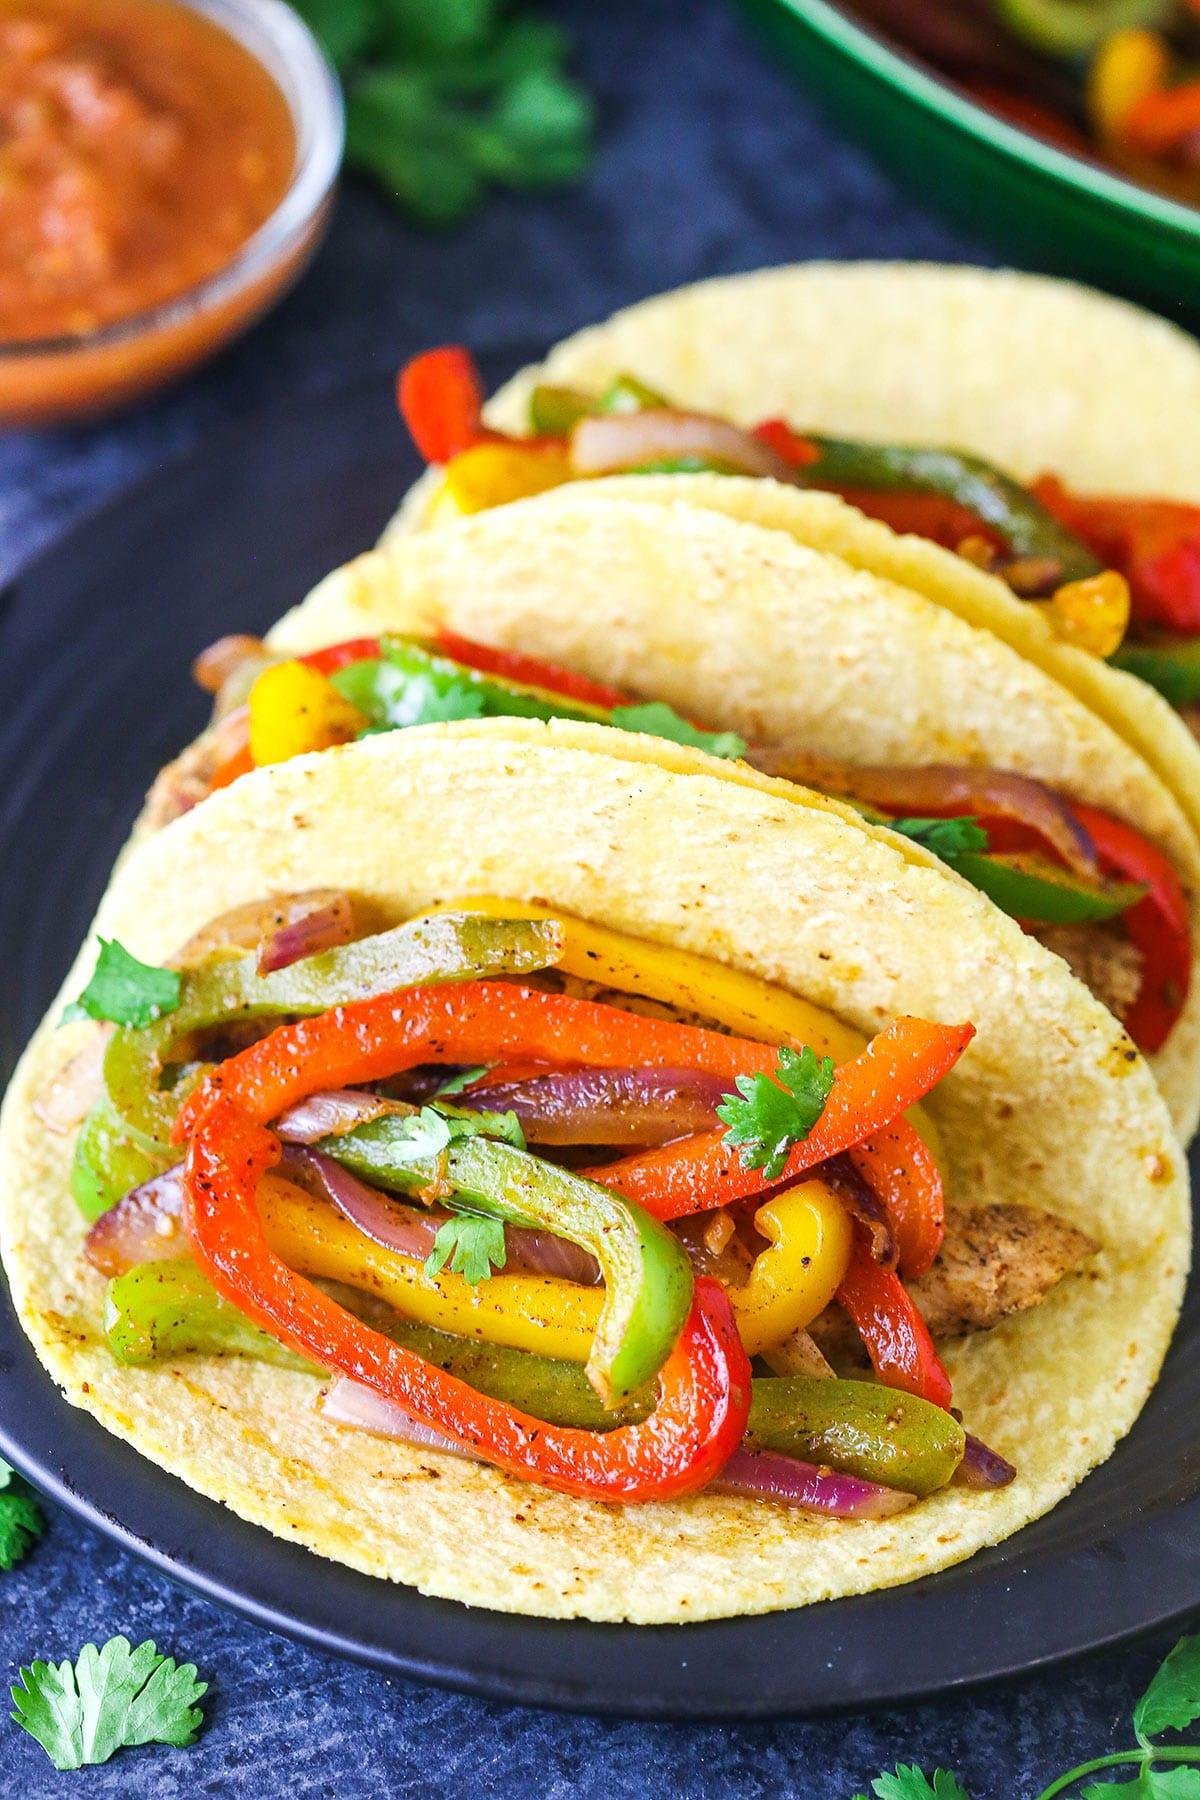 Fajita veggies in a corn taco